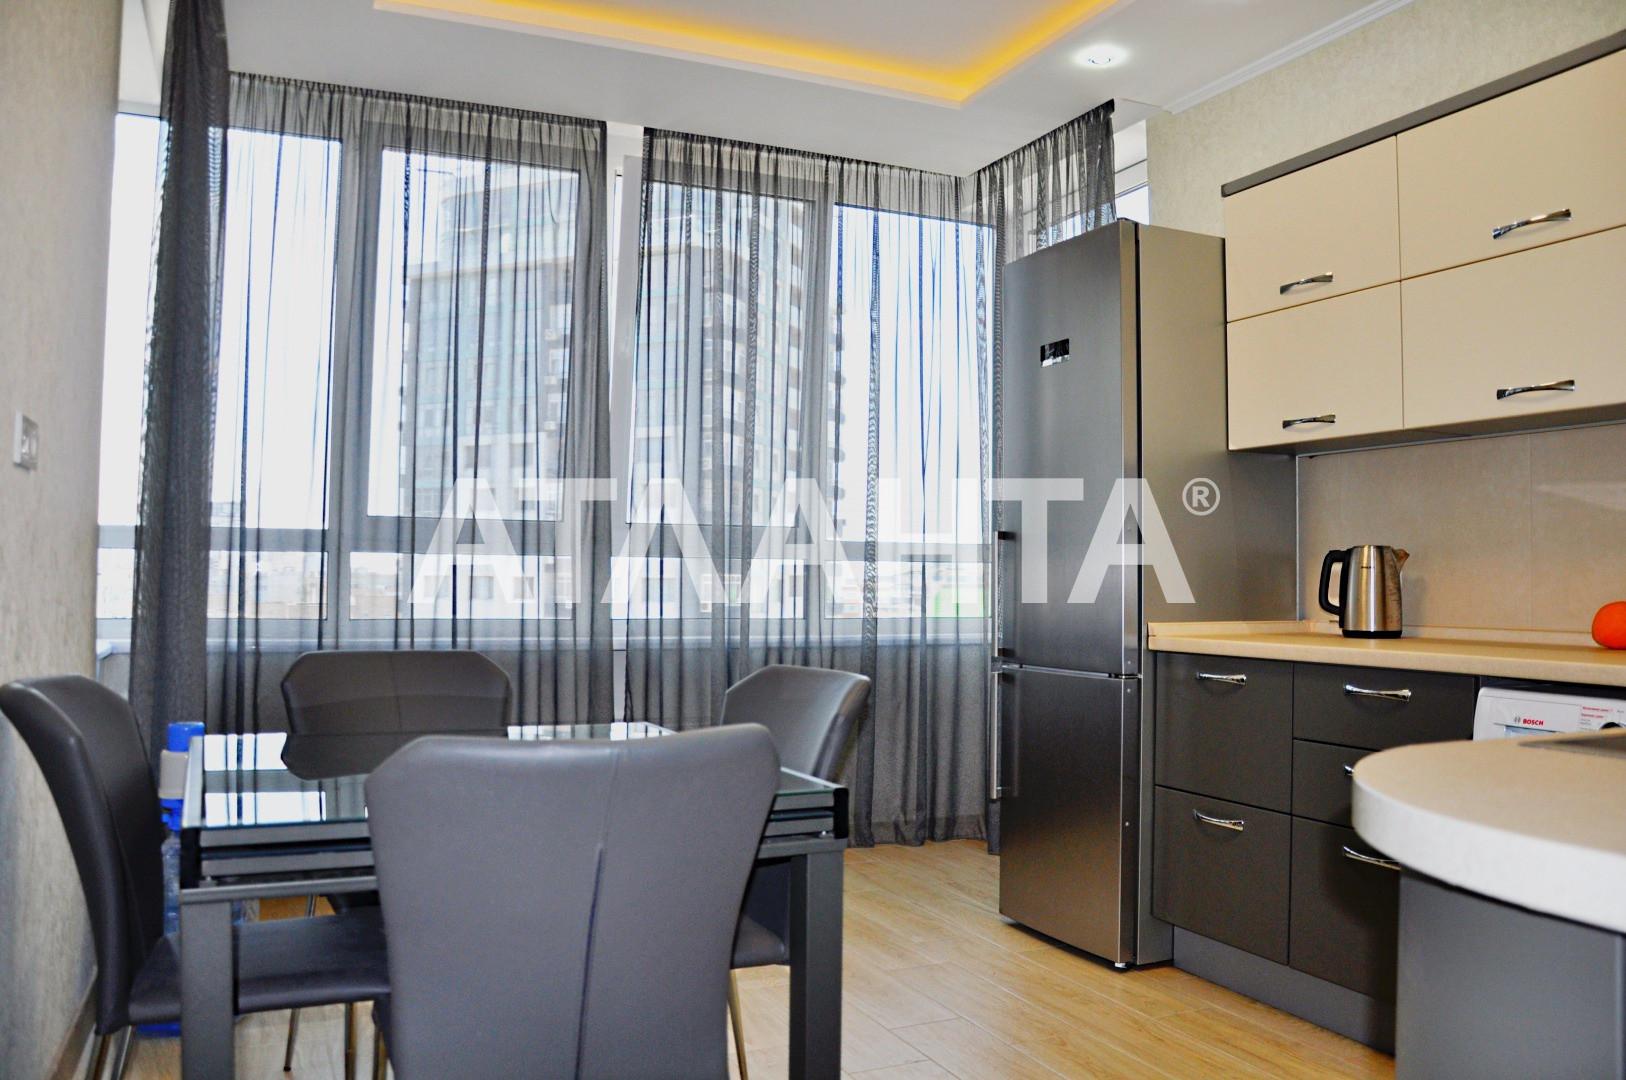 Продается 2-комнатная Квартира на ул. Генуэзская — 130 000 у.е. (фото №4)